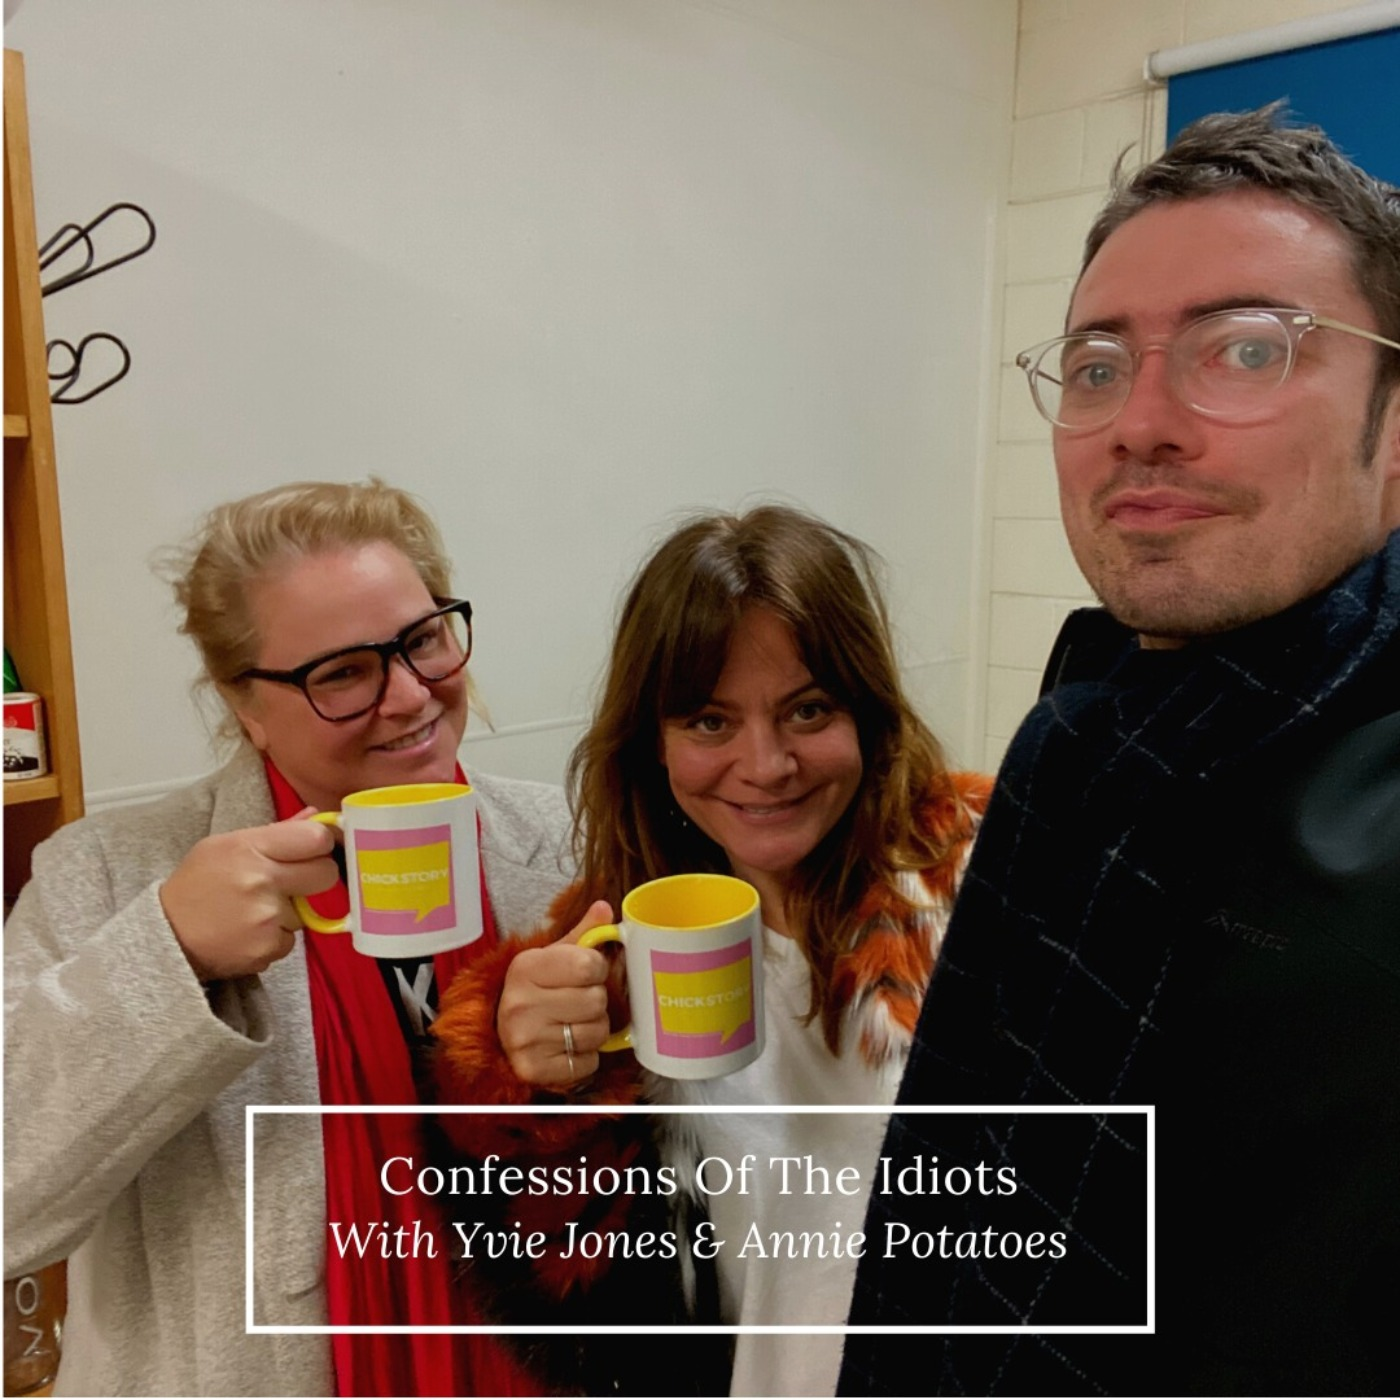 Yvie Jones & Annie Potatoes